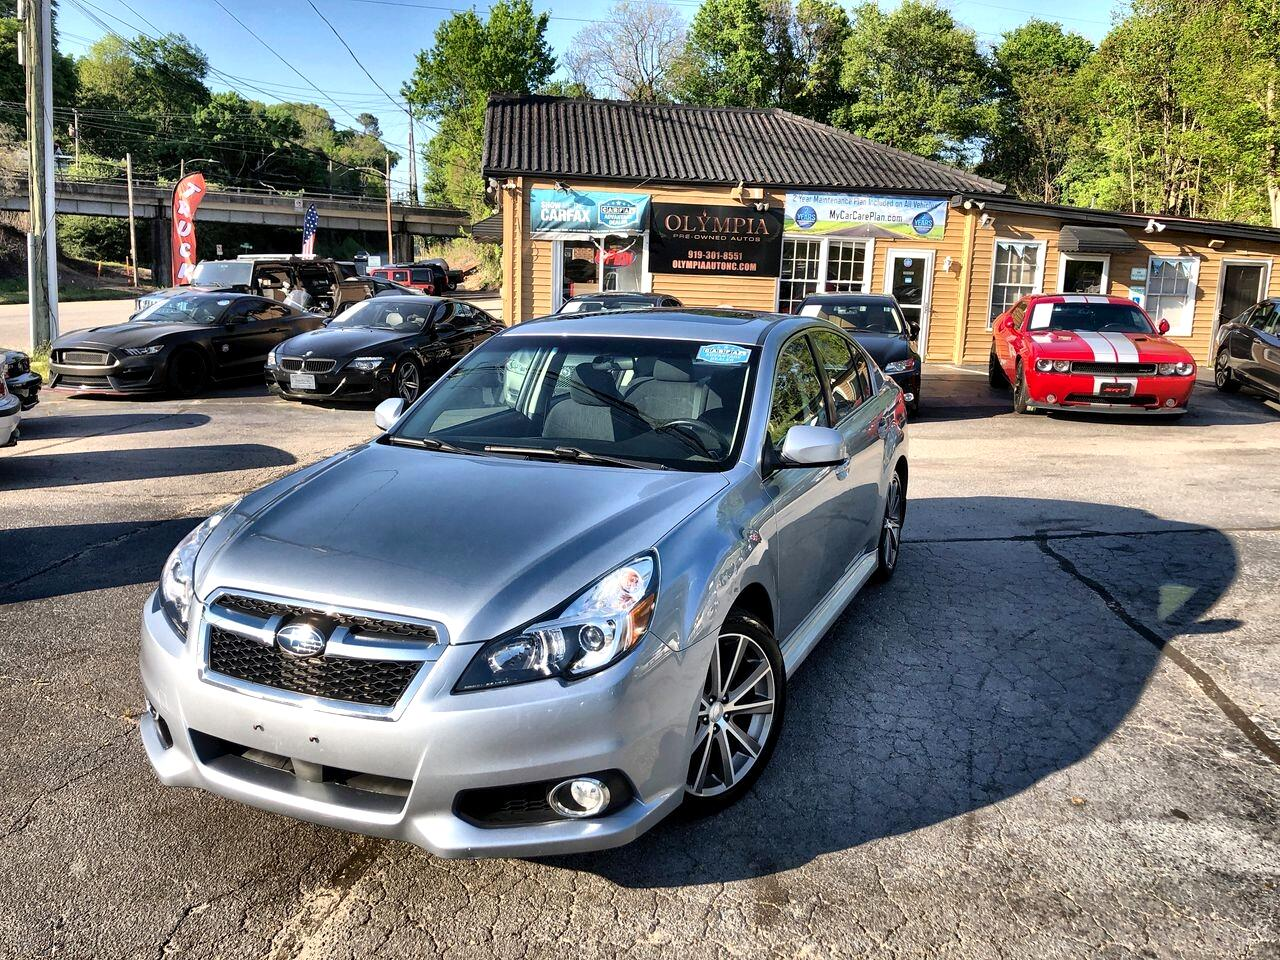 Subaru Legacy 4dr Sdn 2.5i Premium 2013